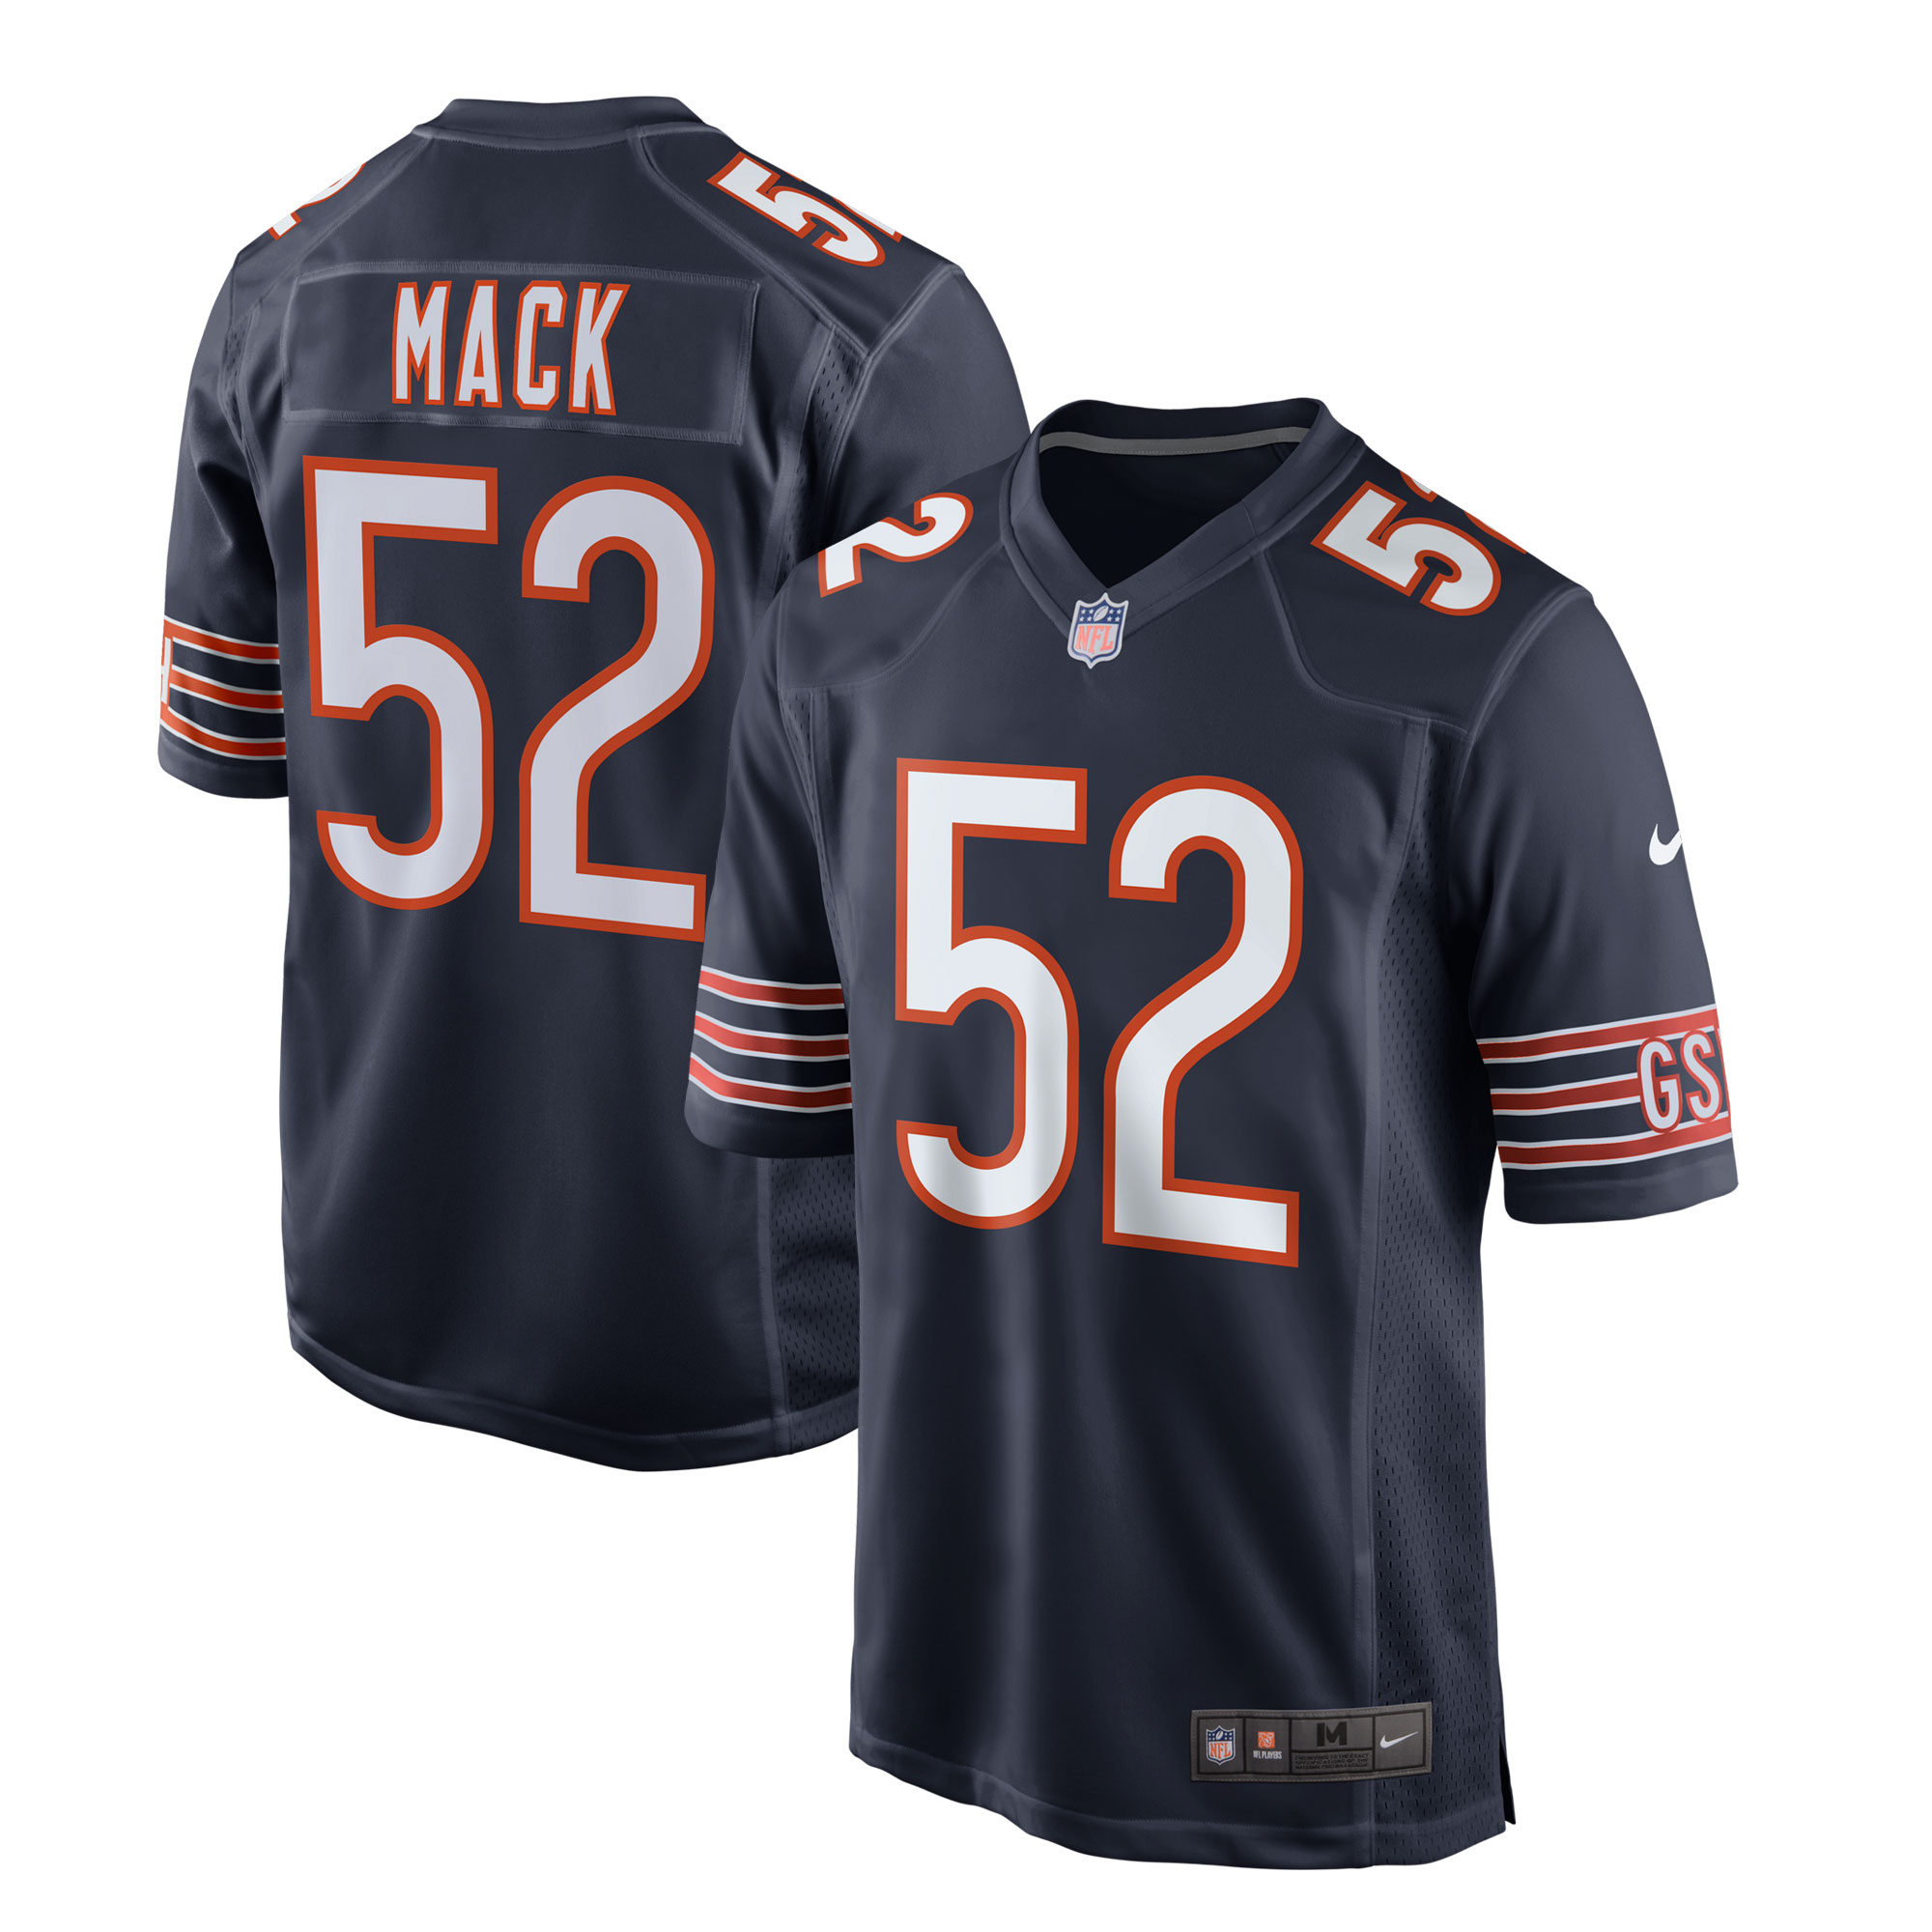 NFL Fan Shop - Walmart.com 4366ceb56